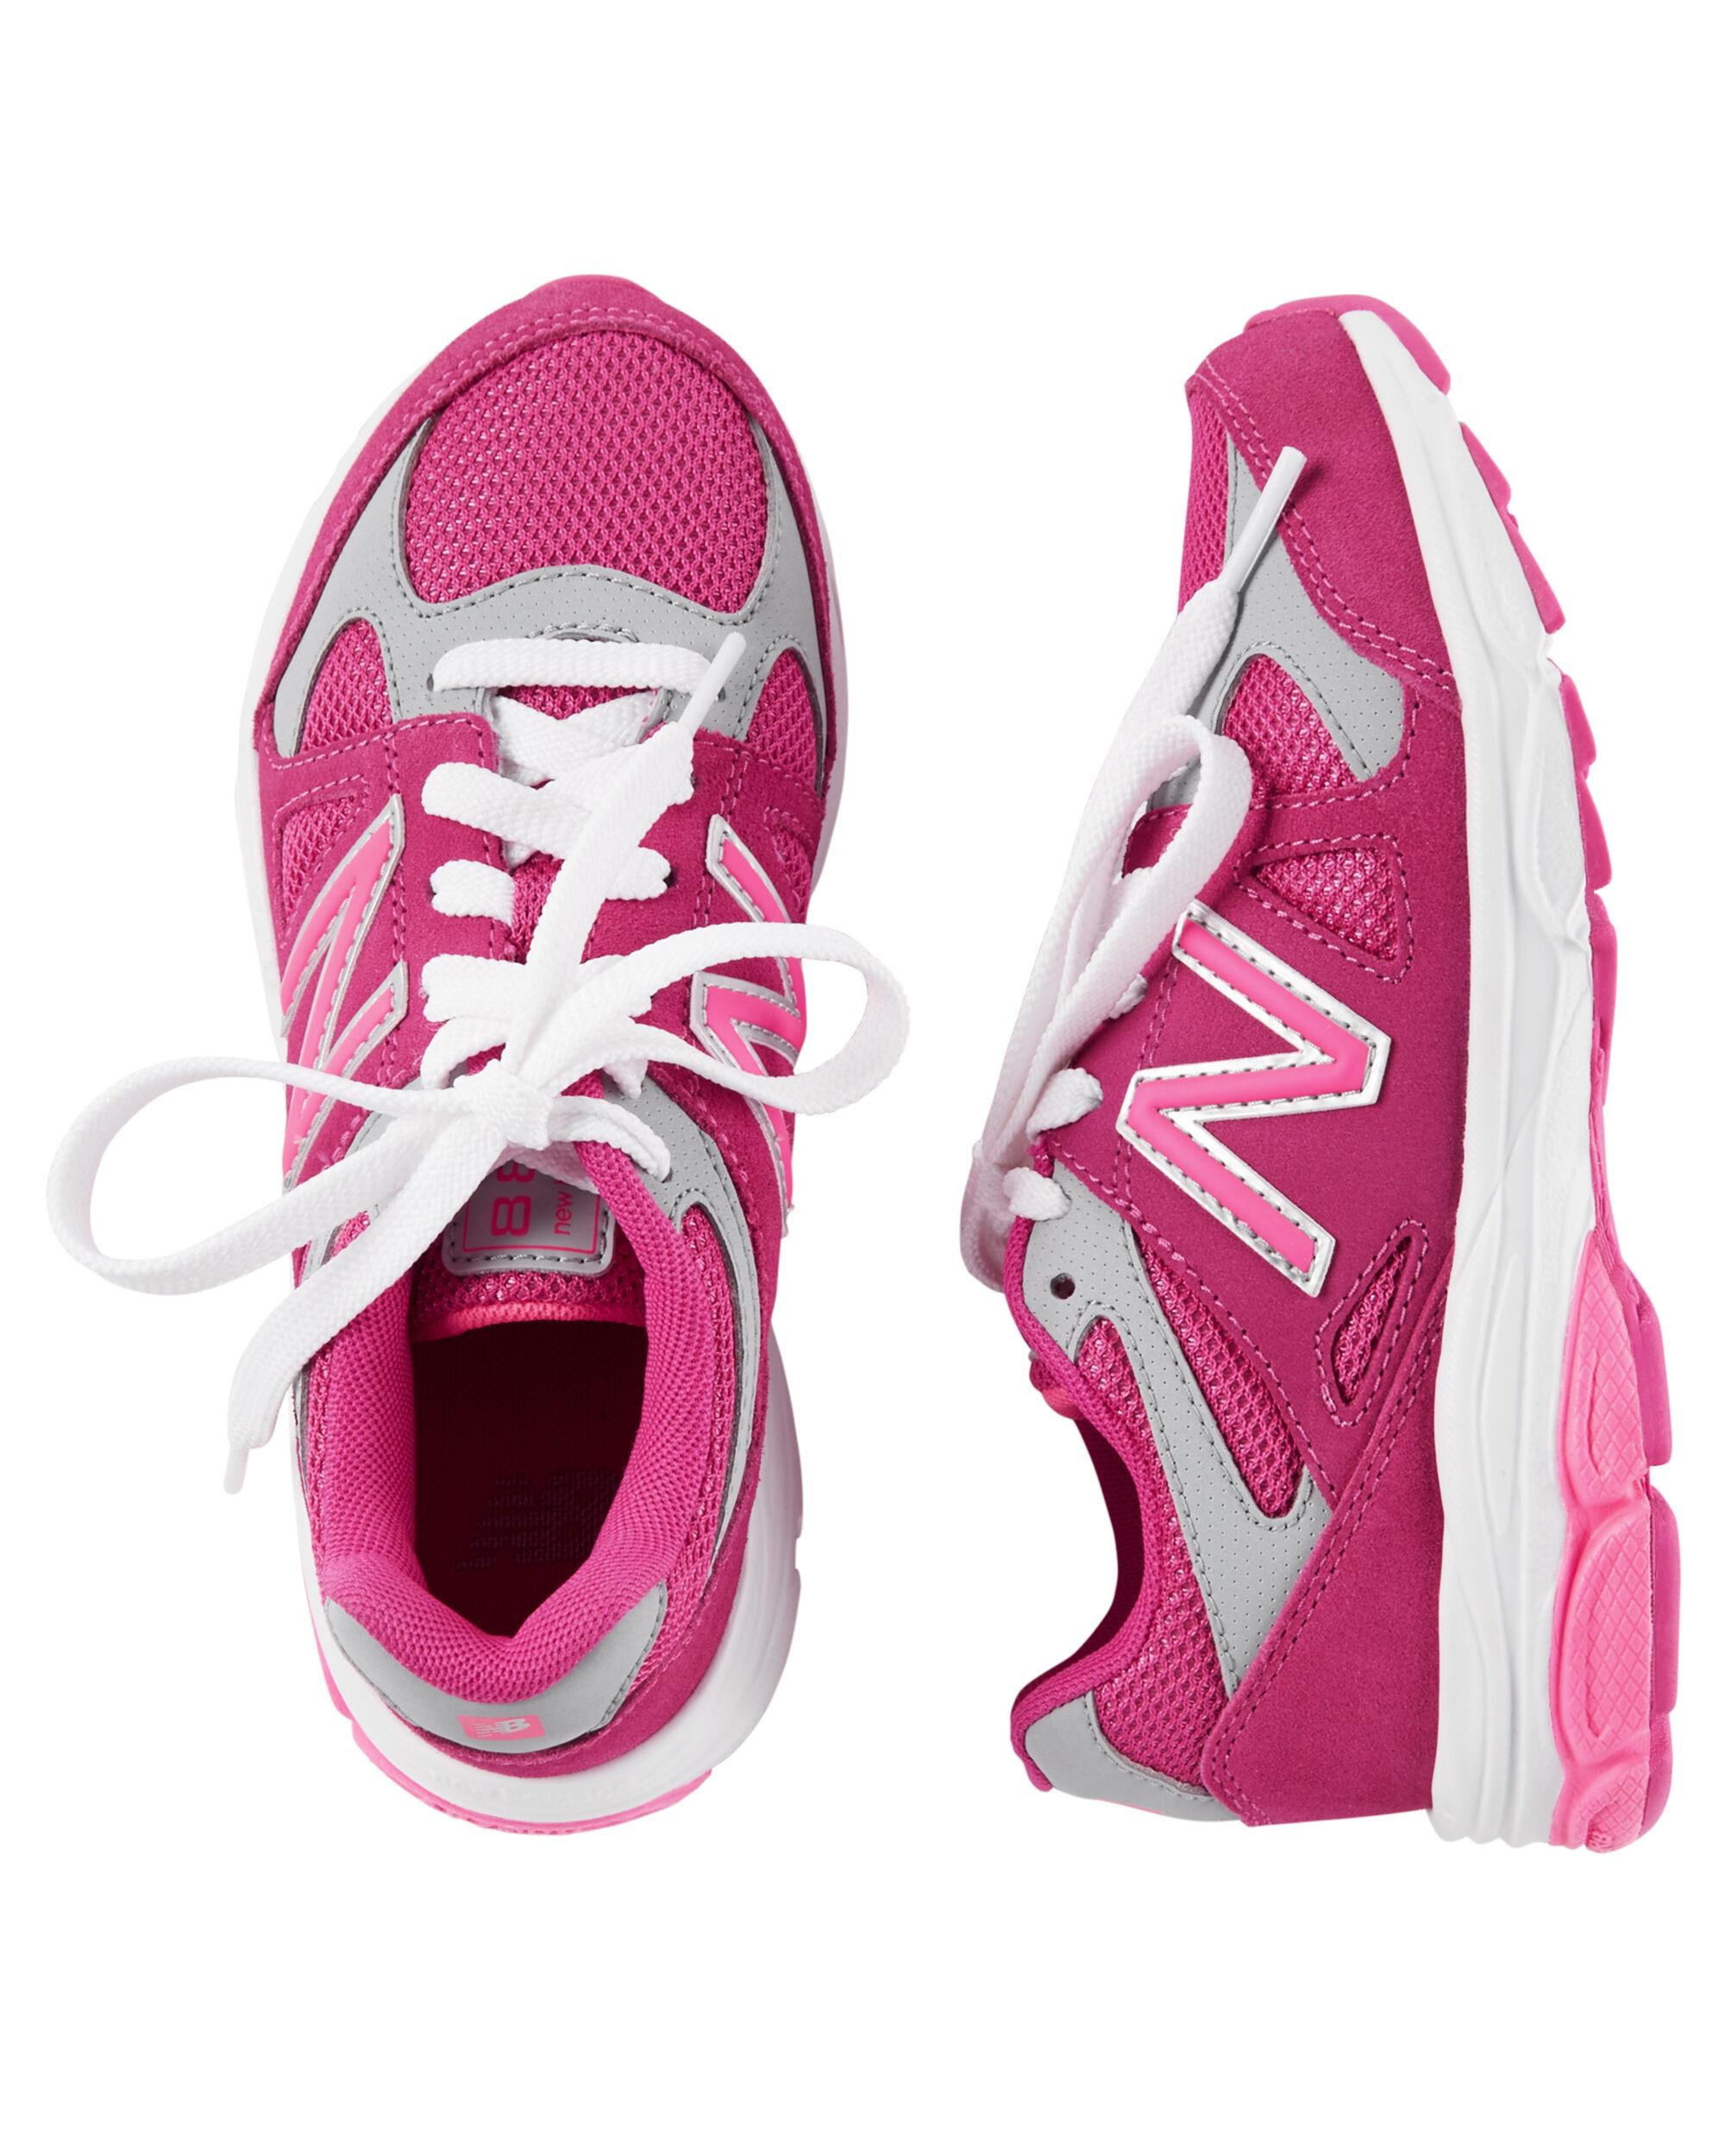 premium selection e693b ec1b9 New Balance 888 Sneakers ...